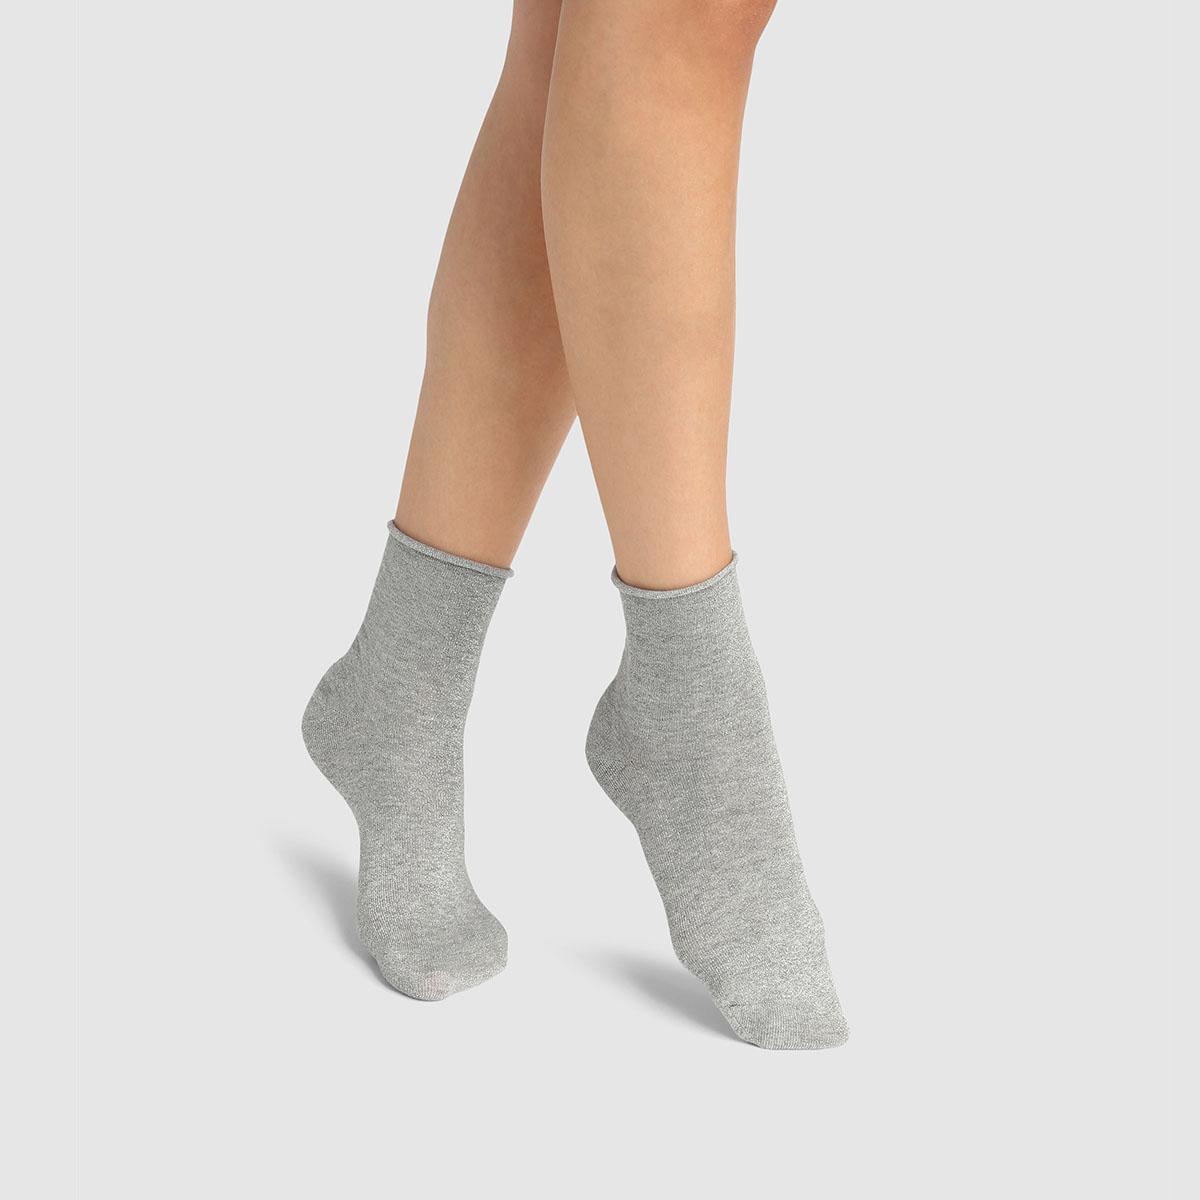 40 pairs luxury women/'s ladies design coloured socks cotton UK size 4-6 NMKFMD